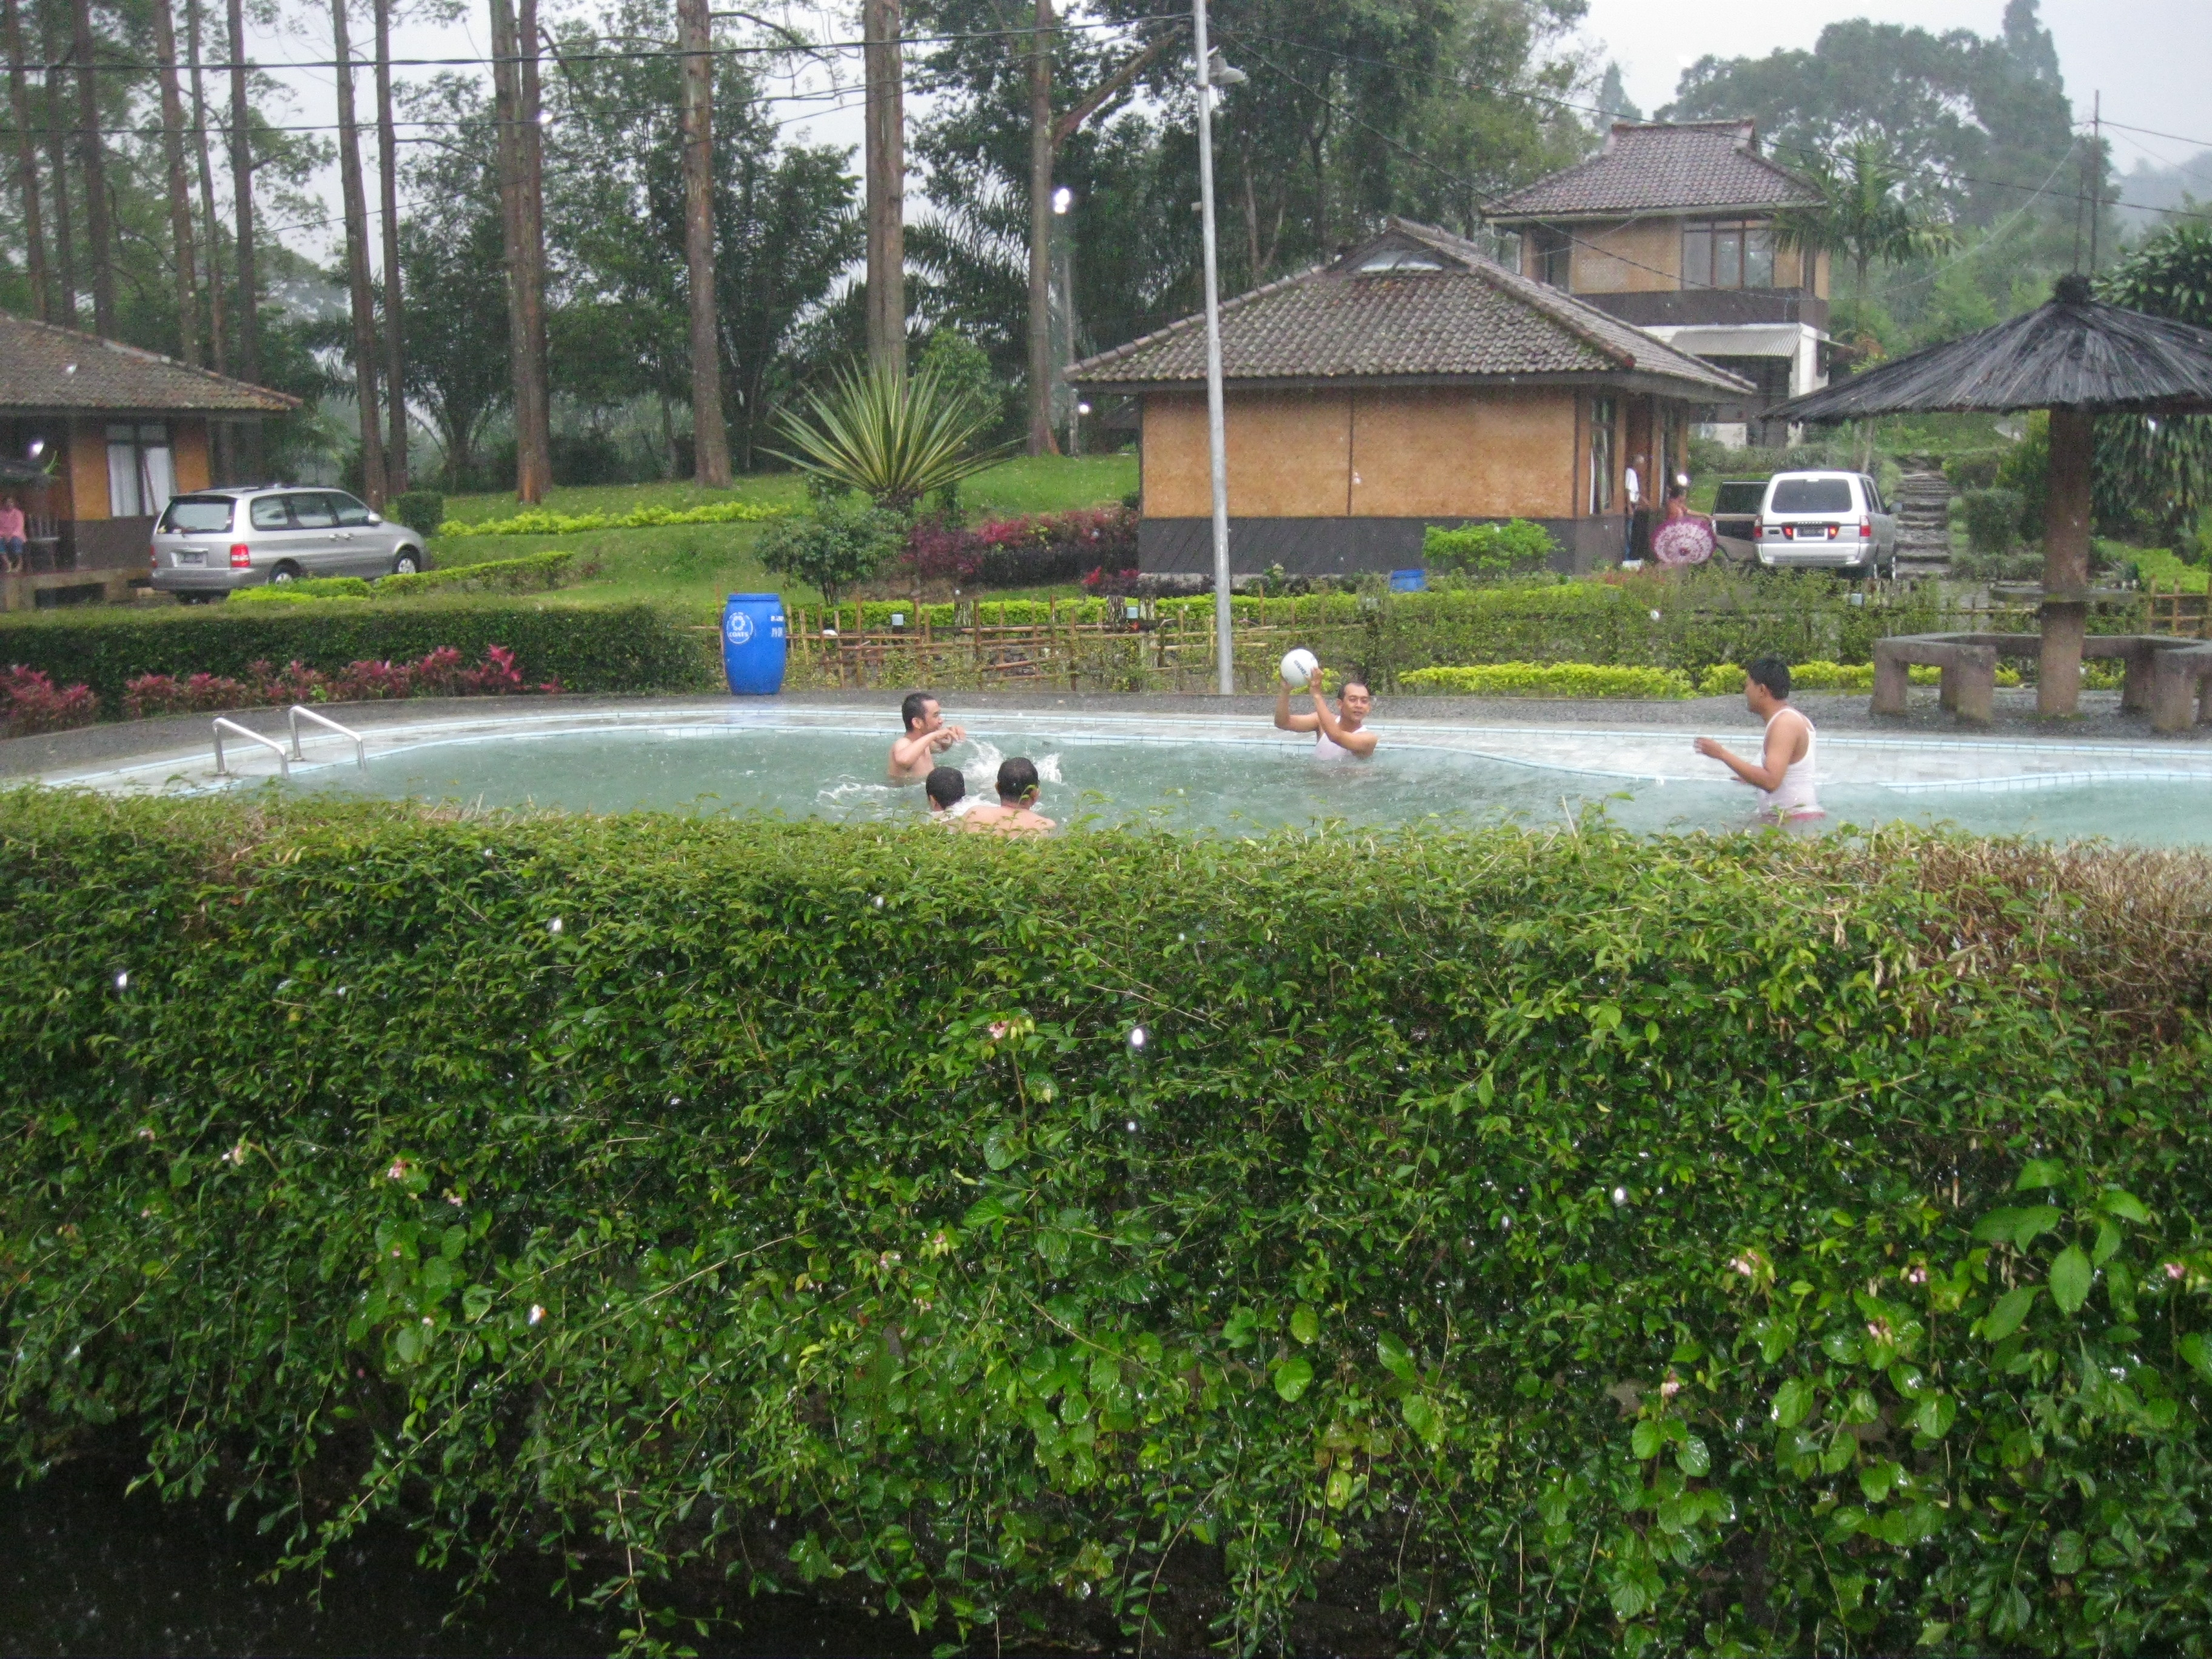 Wisata Alam Gunung Mas Petualang Kere Objek Agro Kab Bogor